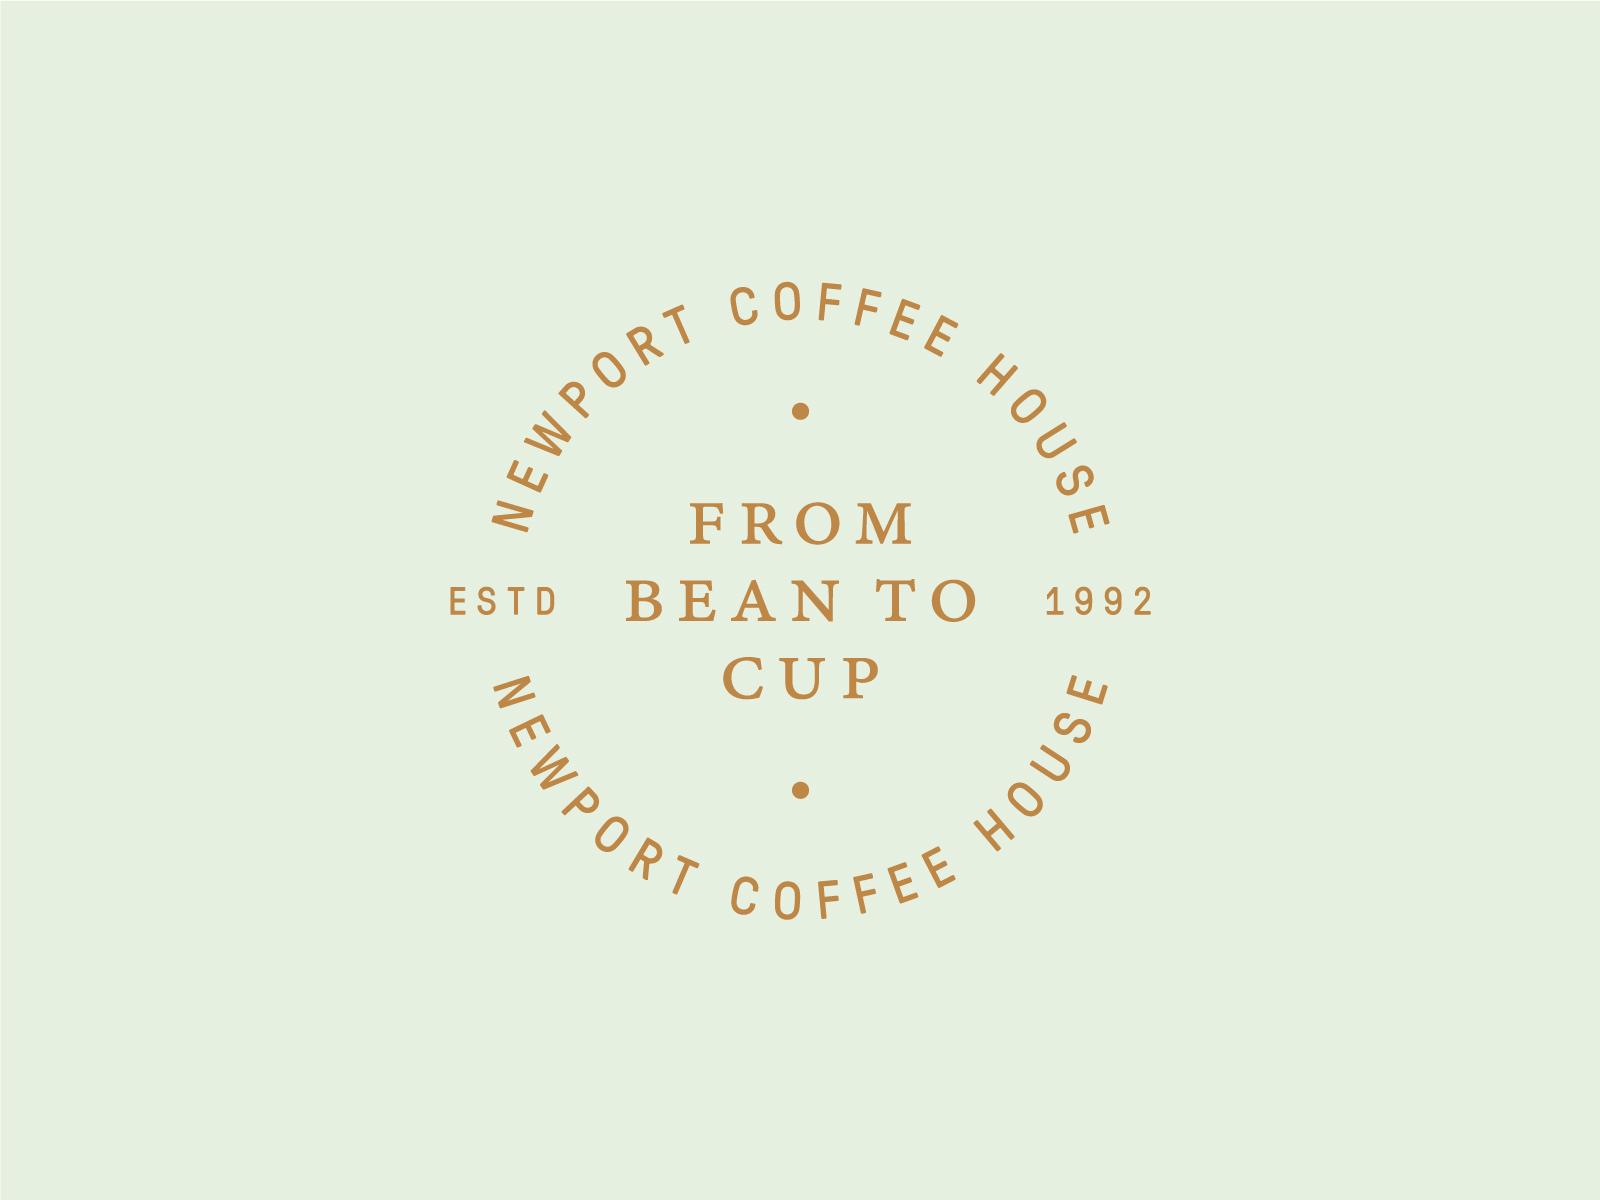 Newport Coffee House 02